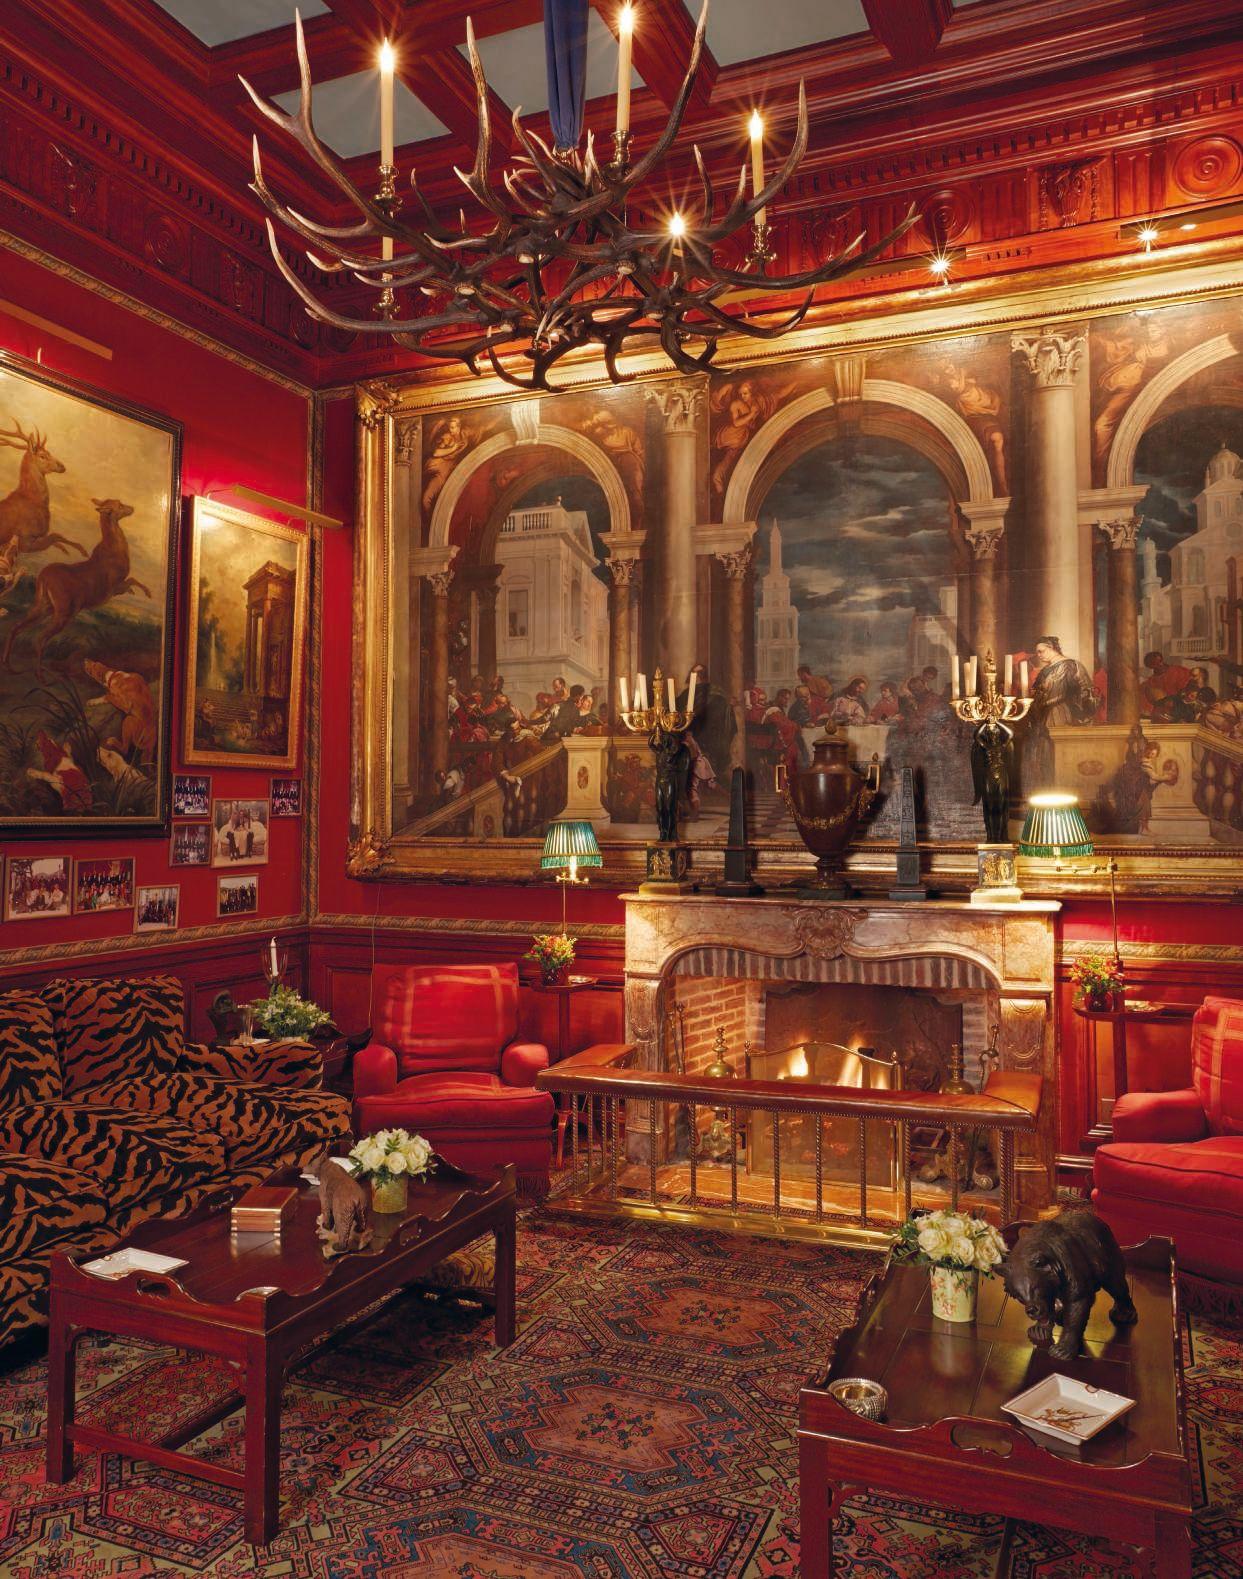 Inside The Beautiful World Of Robert Zellinger De Balkany The Interior Of Pavillon De Ribourg Chateau De Opulent Interiors House Interior Decor World Decor